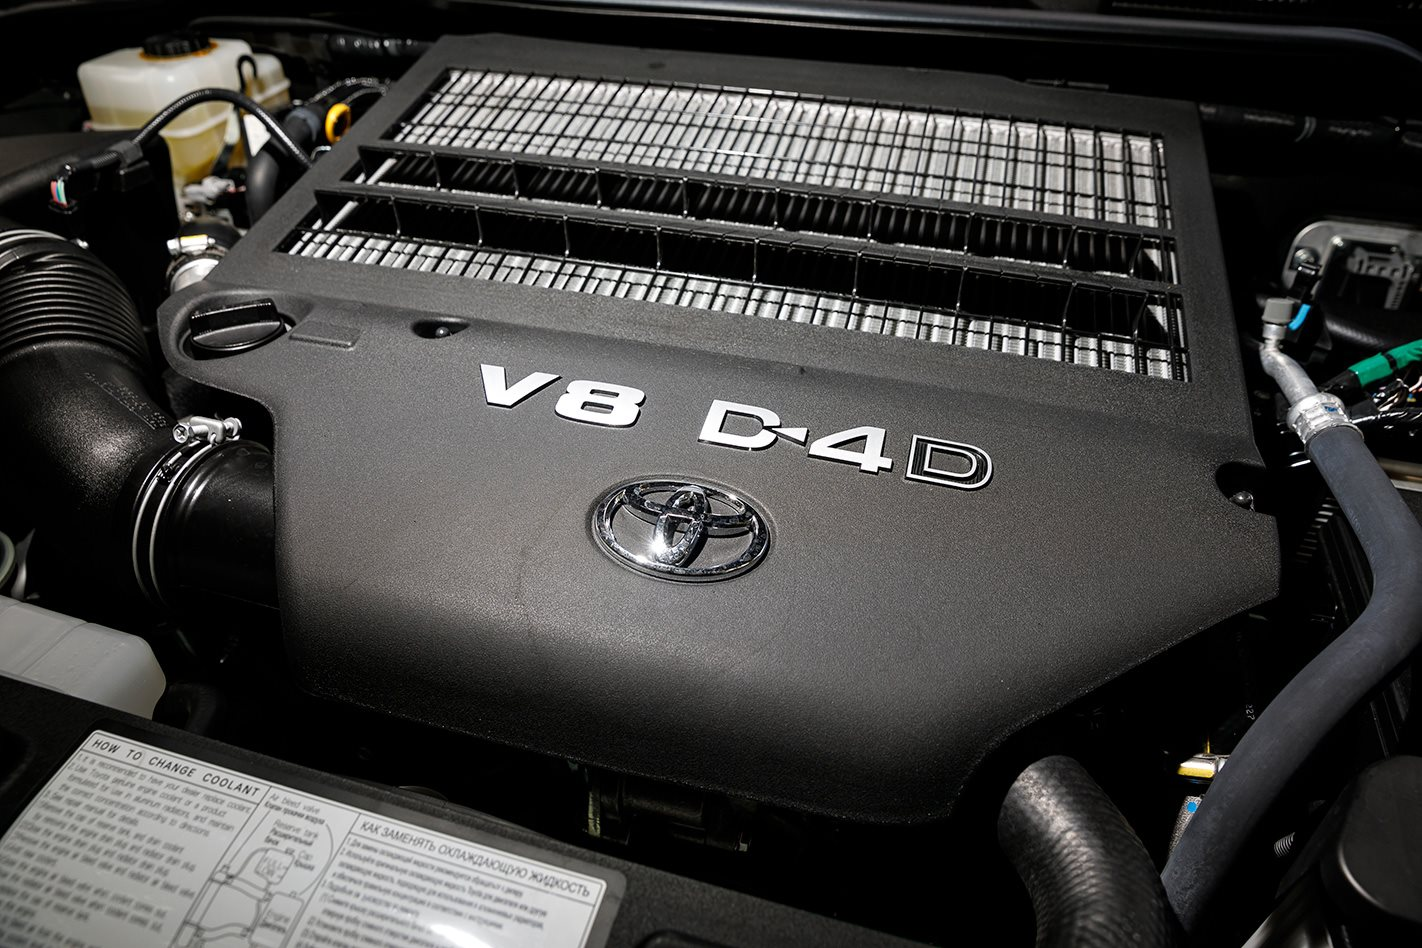 2017 Toyota LandCruiser 200 Series engine.jpg